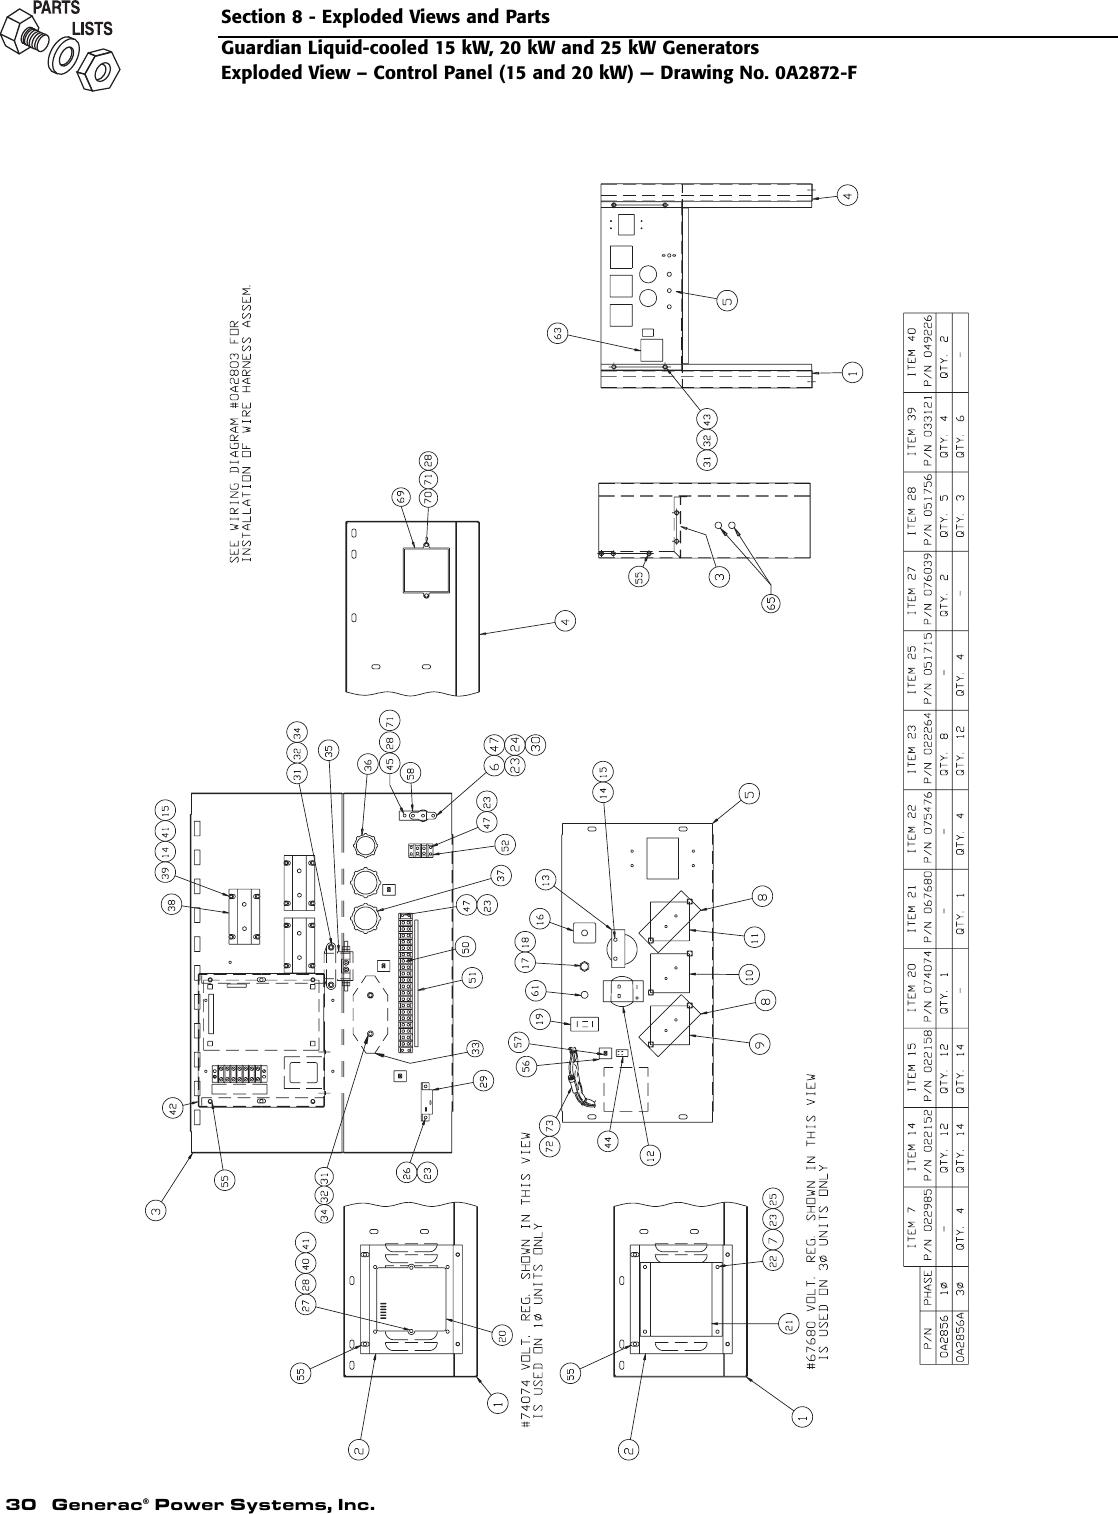 Generac 004188 1 Owners Manual D6444Rev0 on